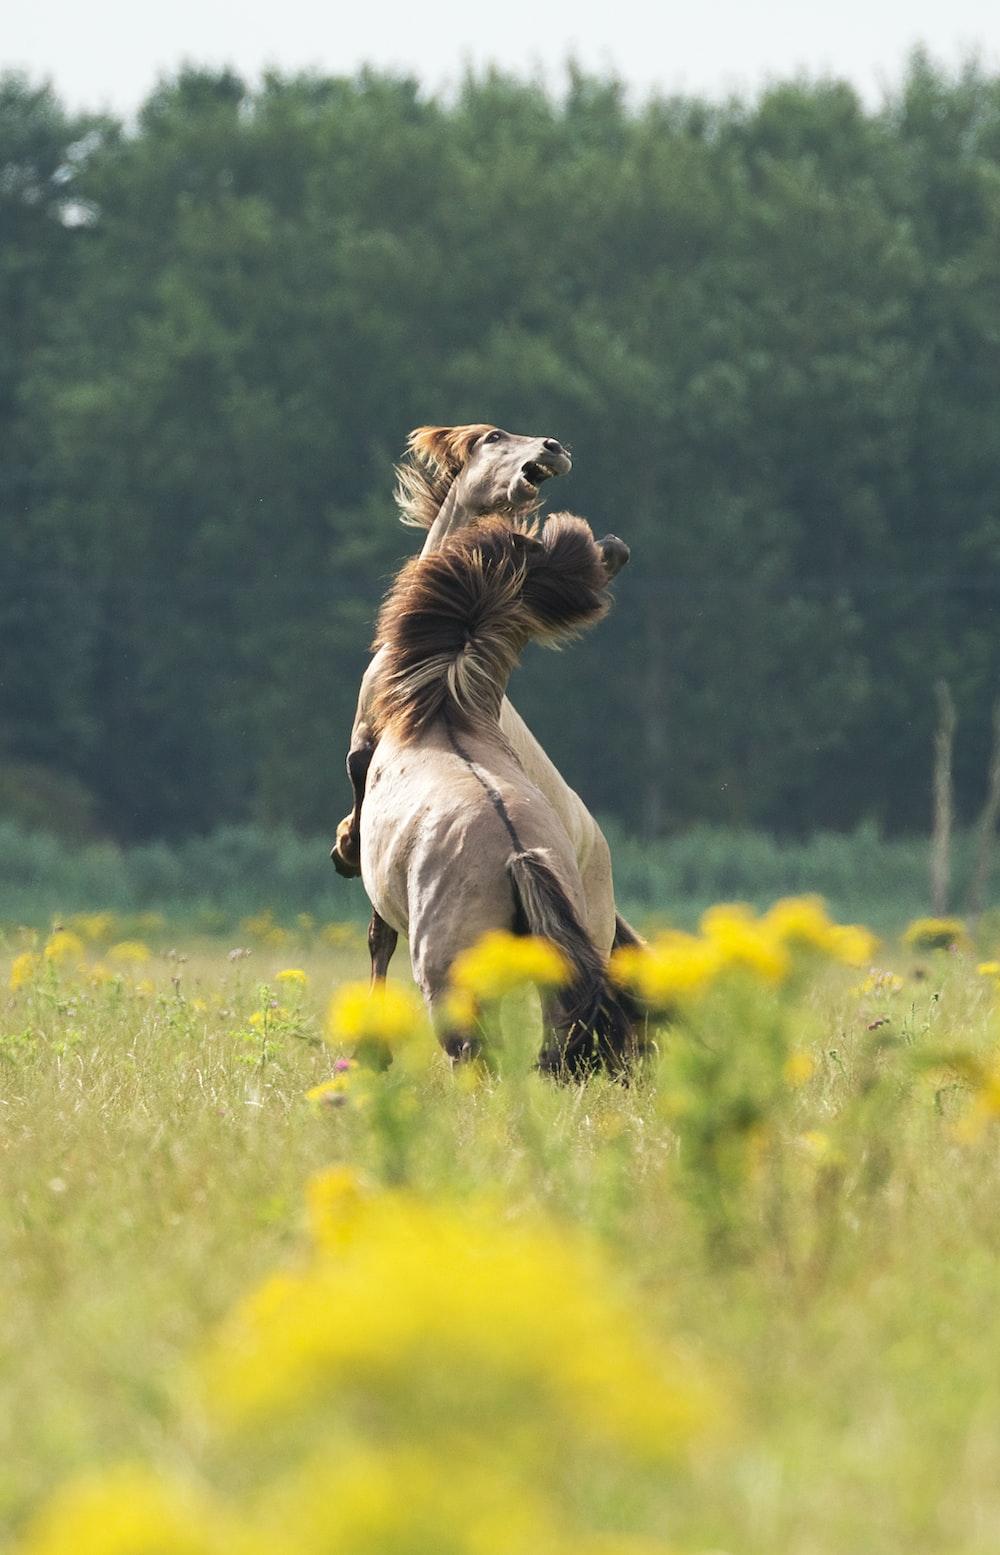 brown horse standing on flower field